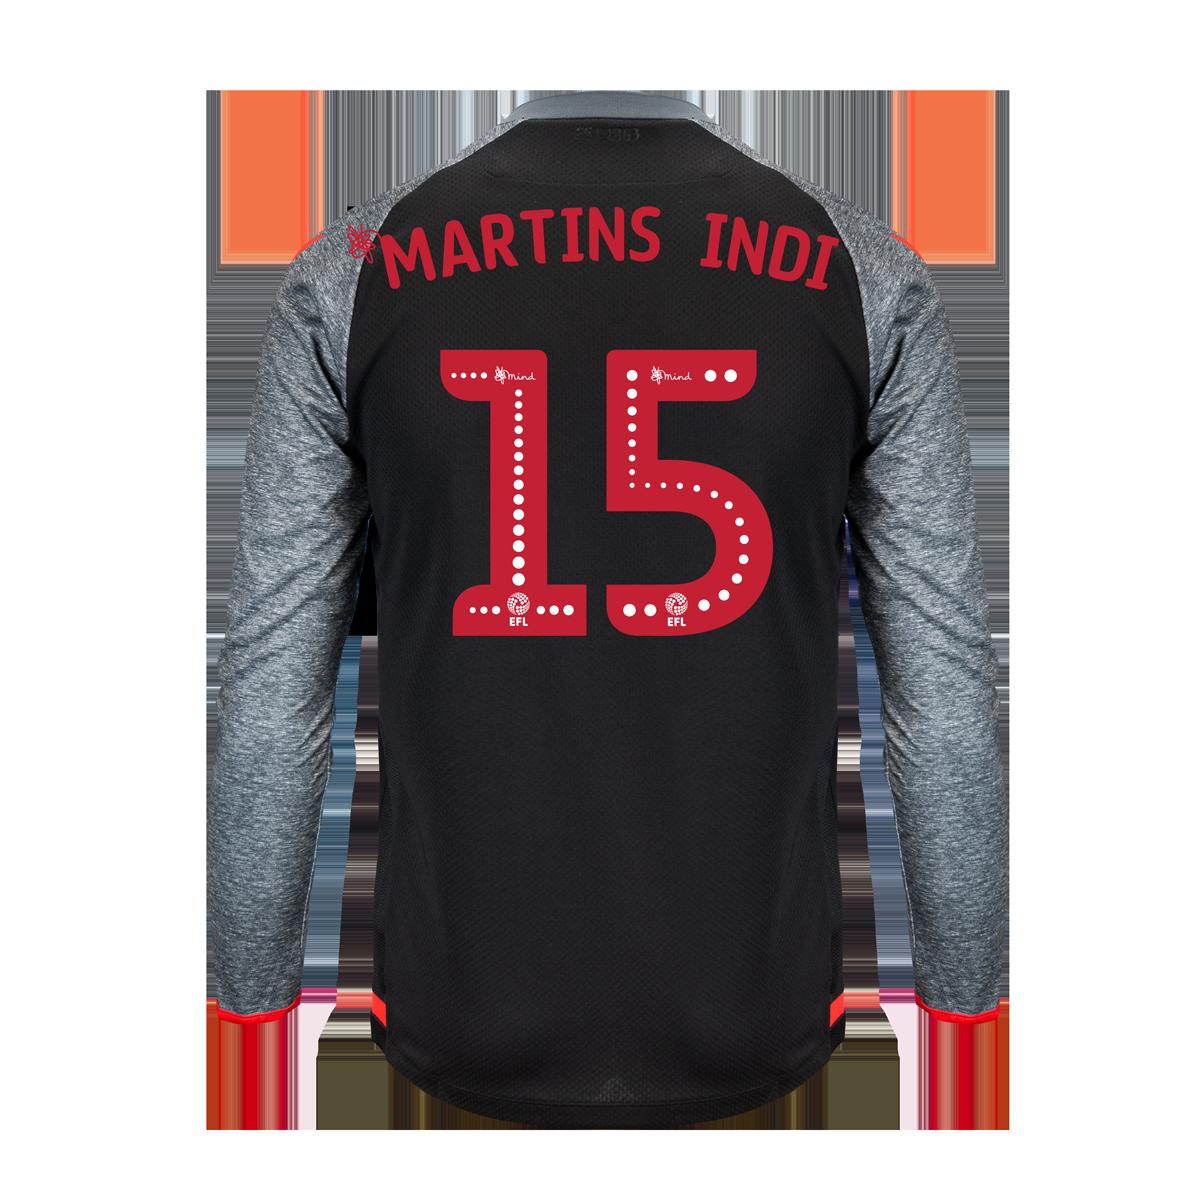 2019/20 Junior Away LS Shirt - Martins Indi